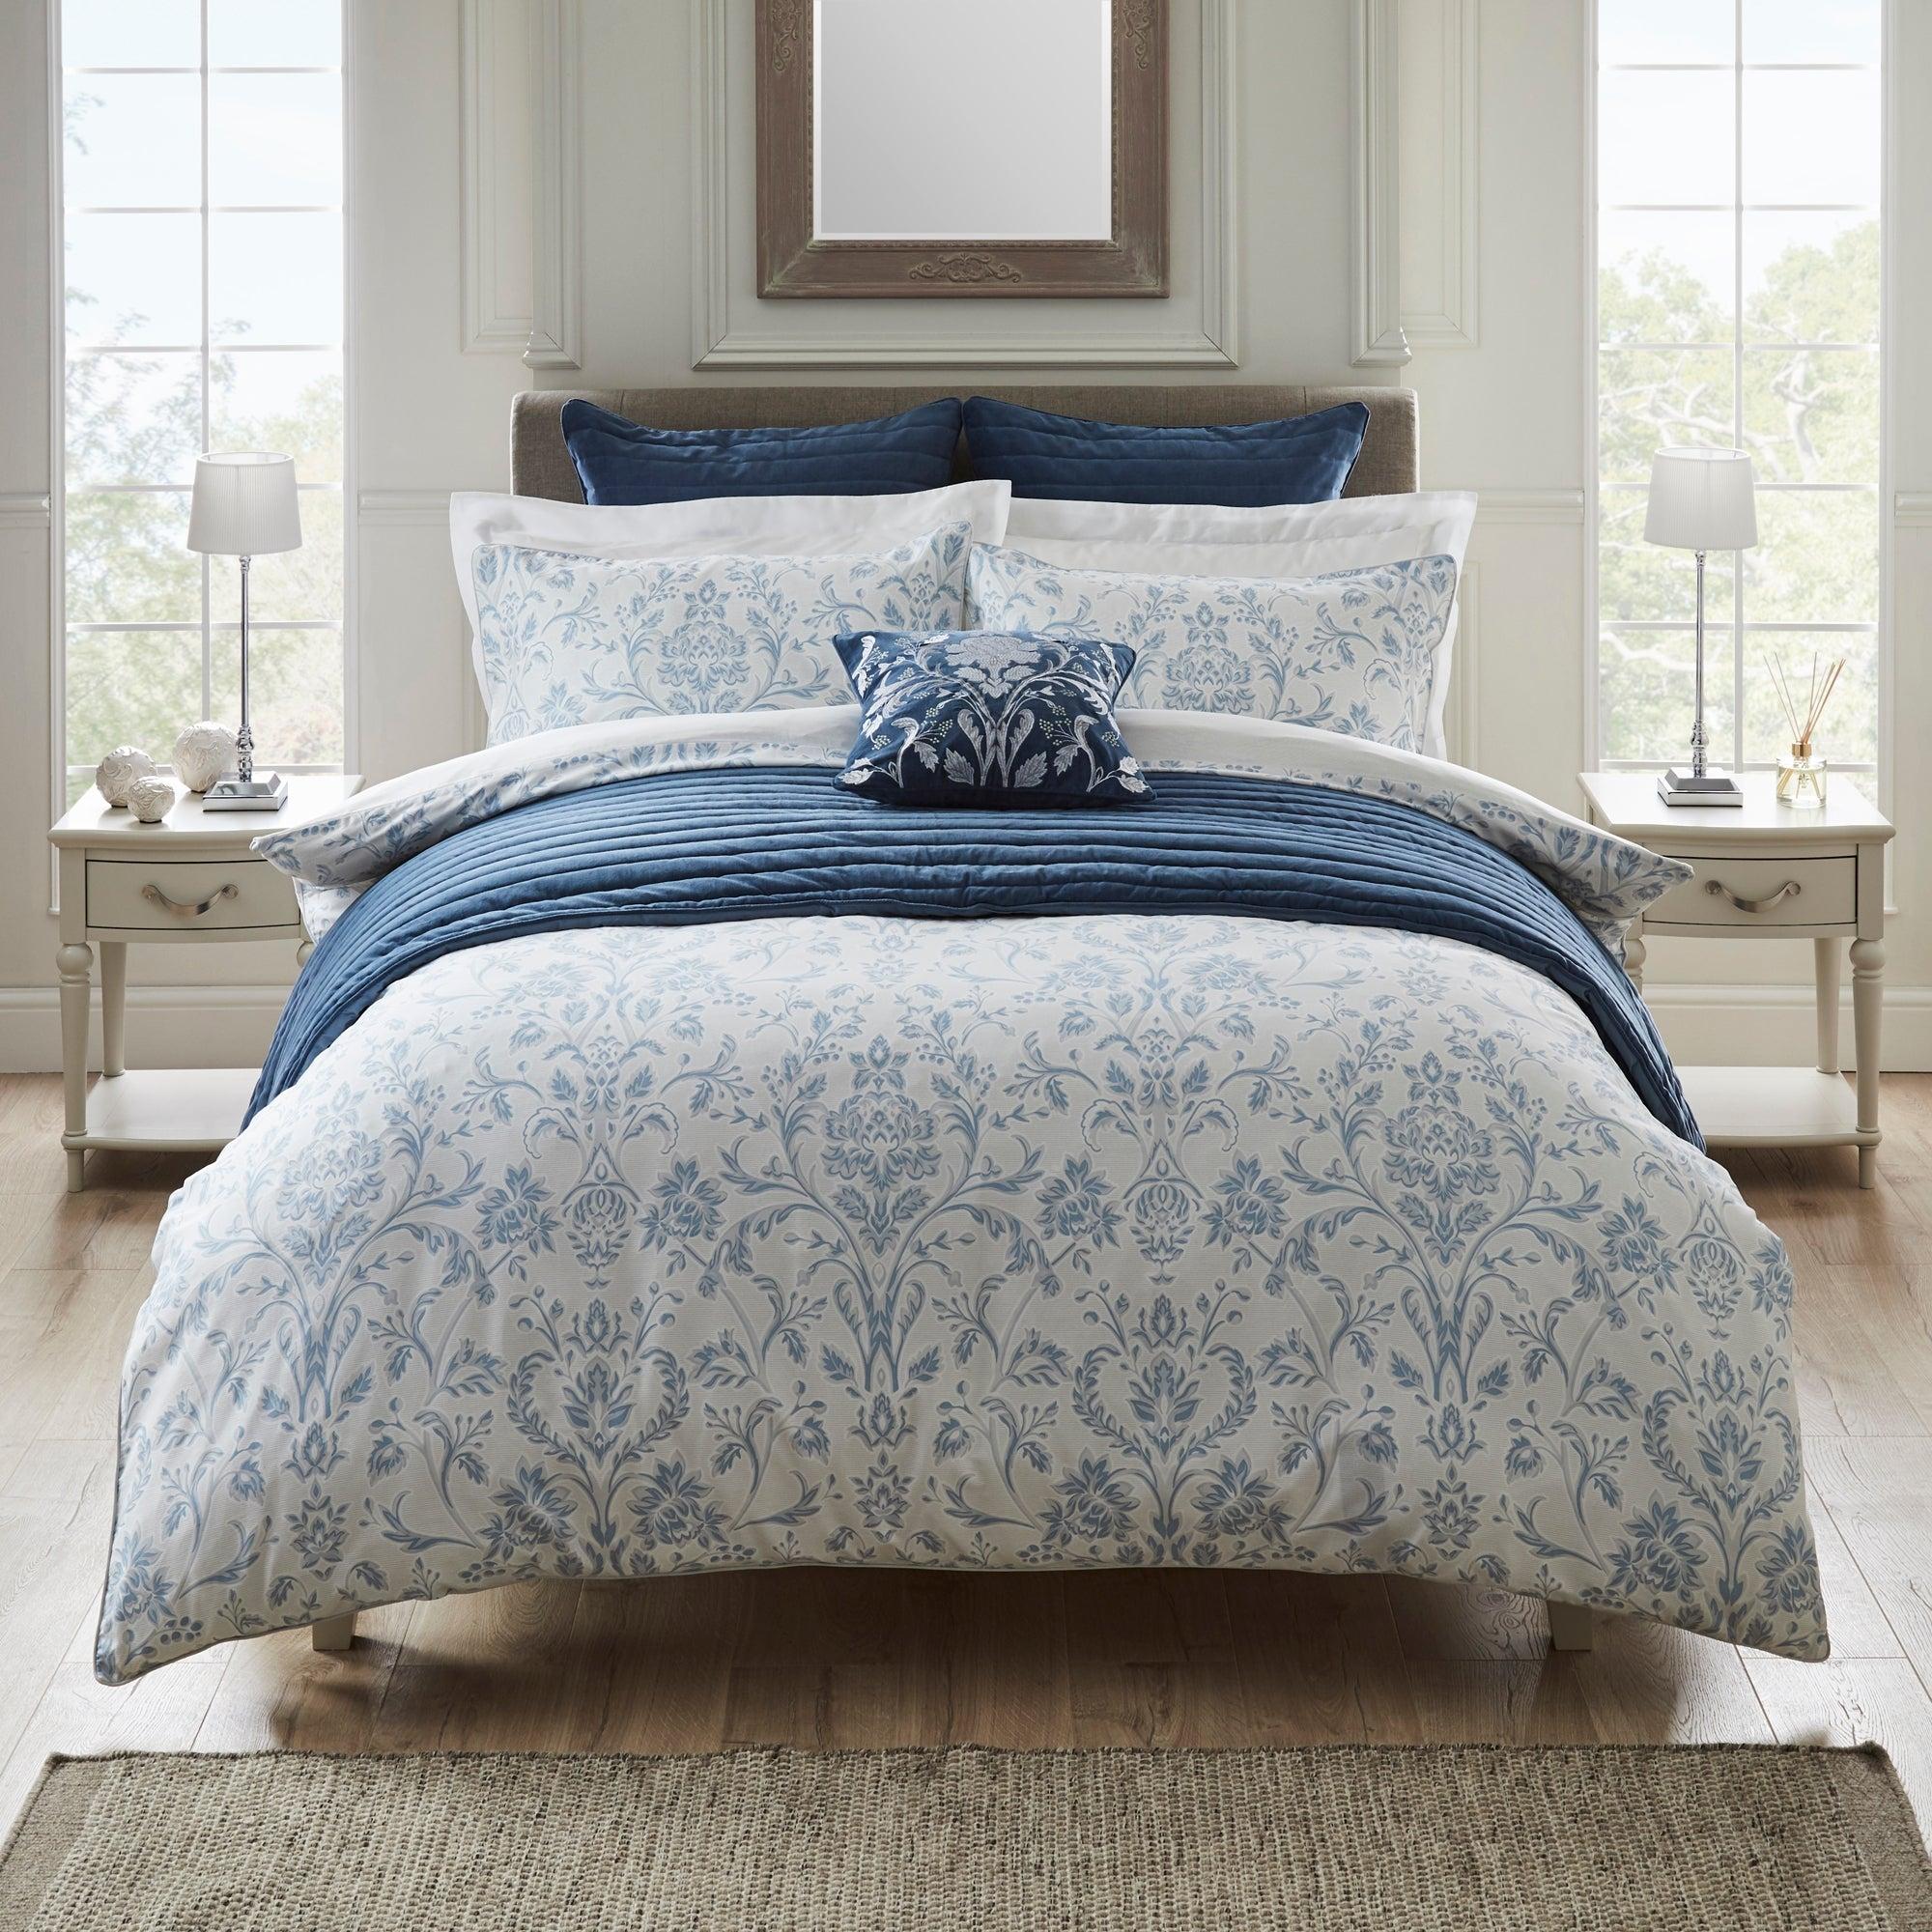 Dorma Dorma Remington 100% Cotton Duvet Cover Blue | Single